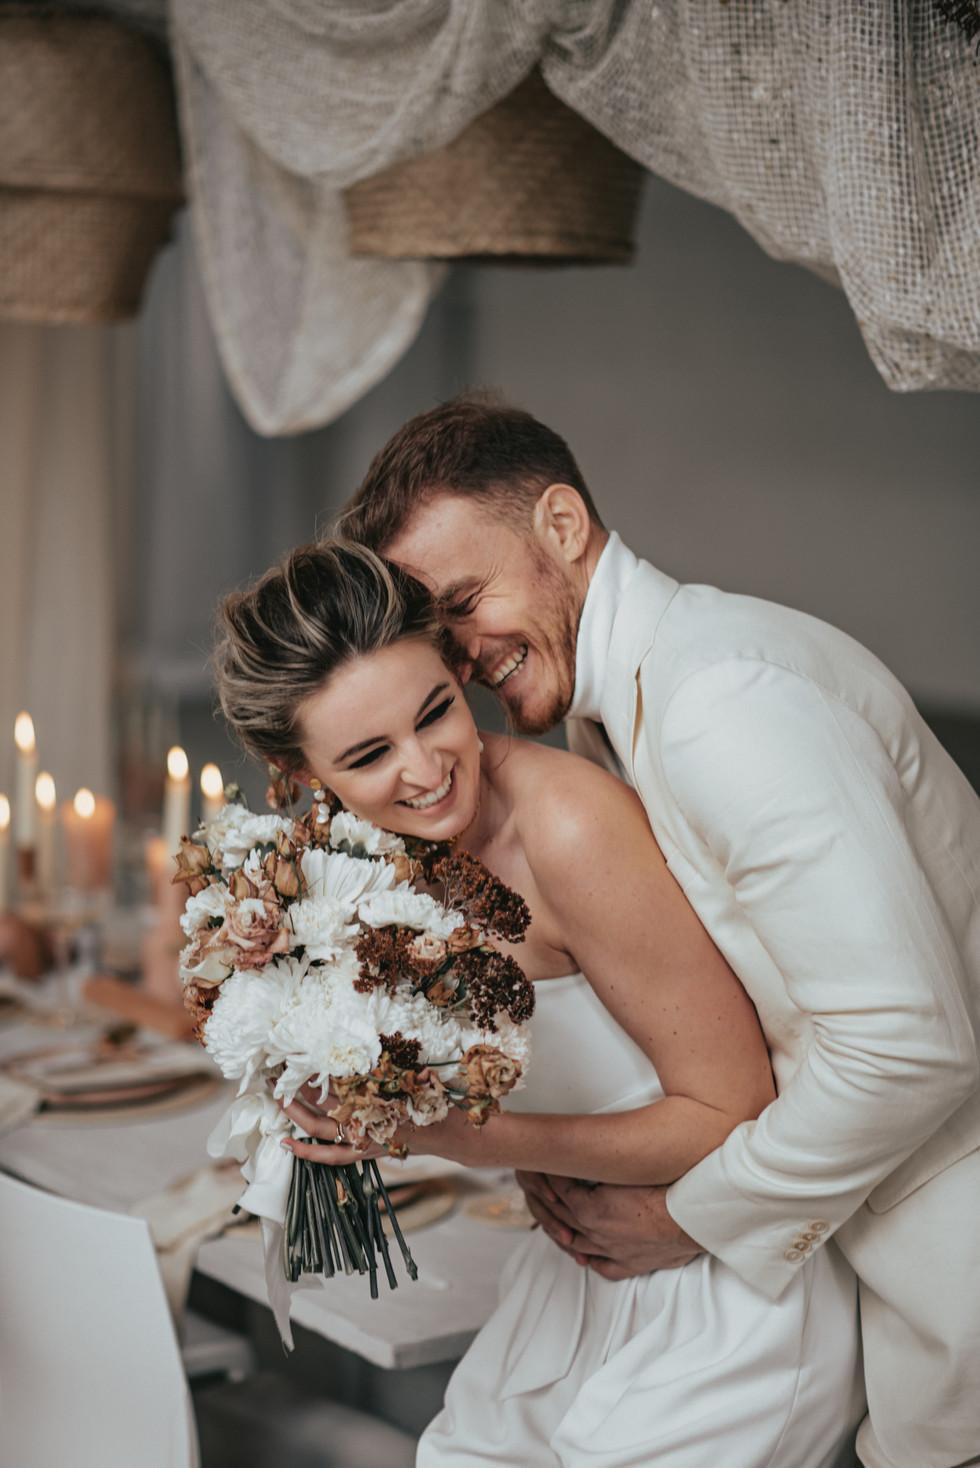 Design & Wedding Planner @nicolepleaseweddings Florist & Styling & Concept @myawina Dried Flowers @la.fleur.douce Photographer @kuenzli.photography  Videographer @gomango.weddingfilms Wedding Cake @a_cake_story_ Make up & Hair @isabelle.hair.and.makeup Hair Accessories @ladyschmuck Bridal Boutique @twosouls_bridal Gown & Cape @byromance Veil & Bridal Shoes @twosouls_bridal Head Band @aura_bridalwear Bridal Cover Up @isabelle.hair.and.makeup Groom Suit, Accessories & Shoes @eniline.ch Wedding Band @therayy Earrings @lamanojewellery Engagement Ring @sonjettis Stationary @blattpapier_ch Art Paintings @sky.art.paintings Furniture Rental @partyrentschweiz Decoration Rental @vonrock.de Accessories Rental @tautahome Bride @dinaambuehl Groom @yannik.beyeler Couple @dynannik Wedding Venue: Artist Atelier